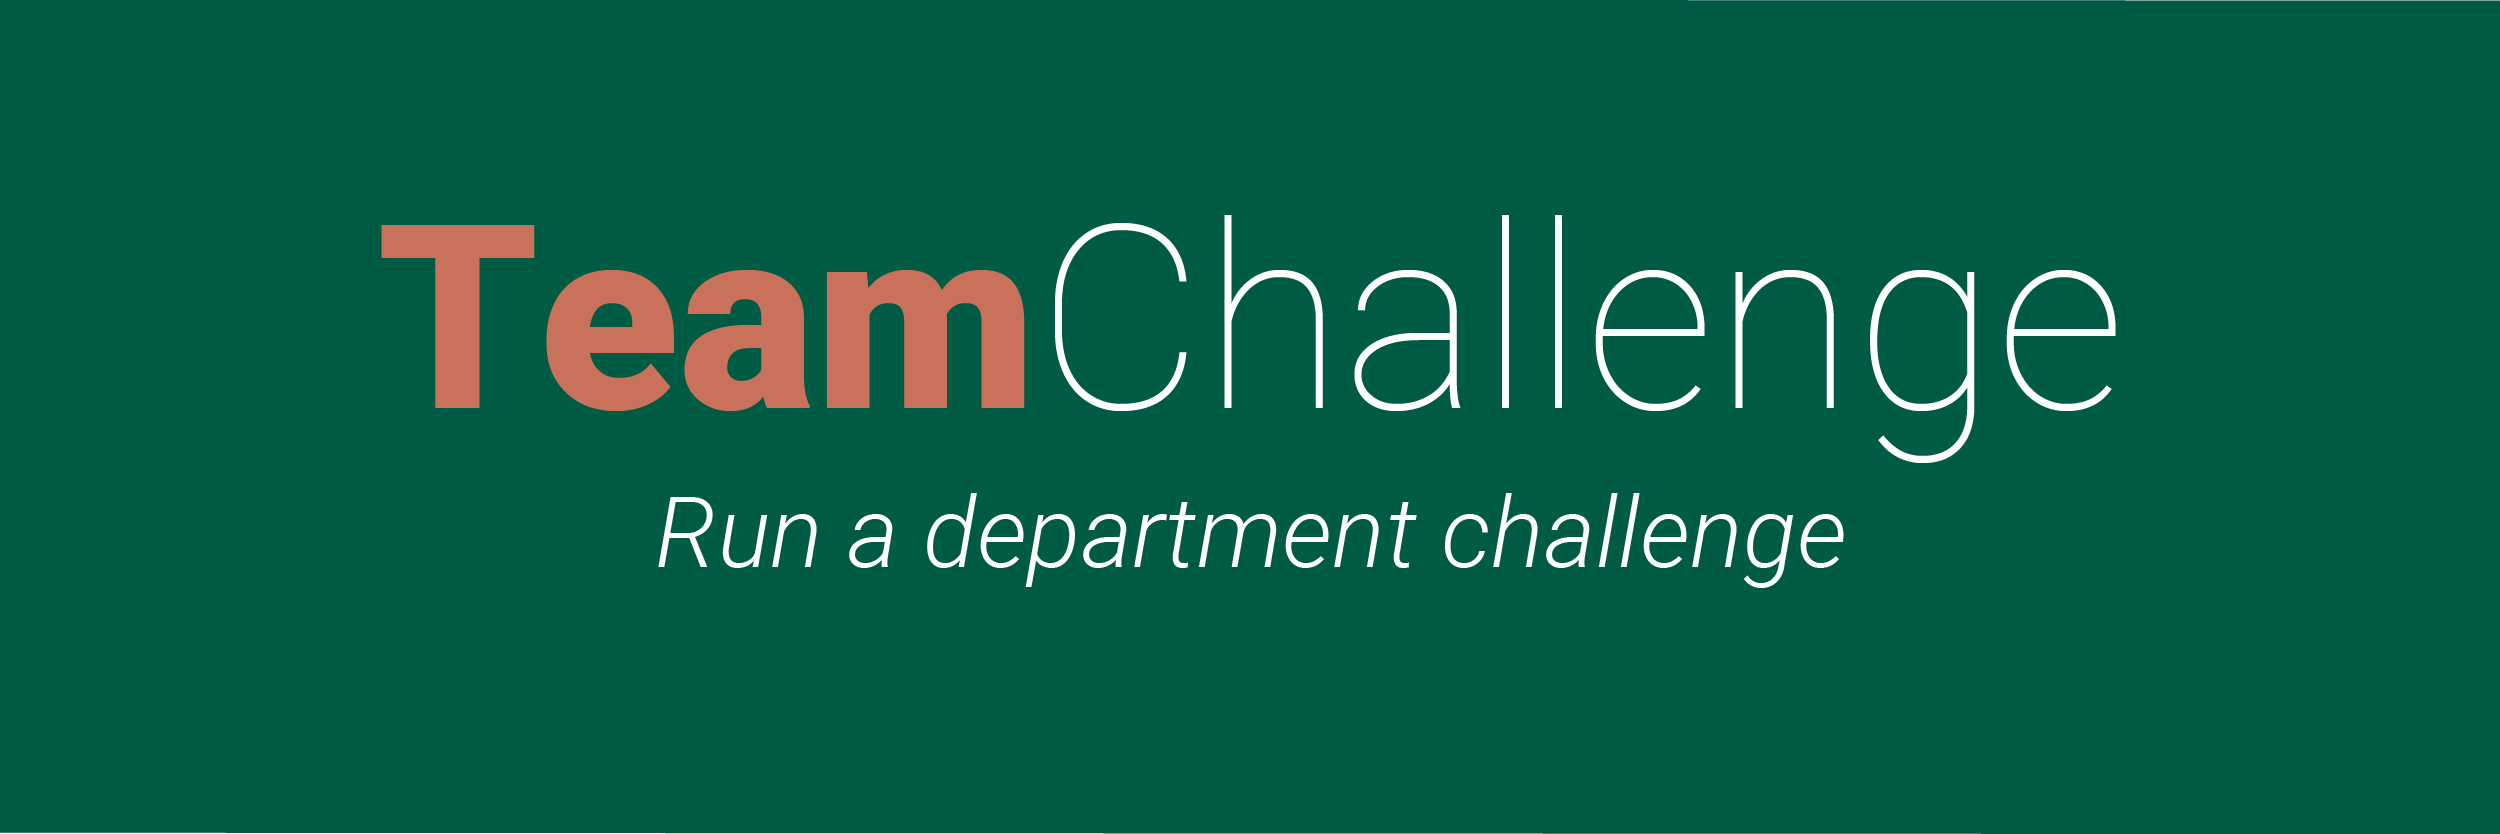 Team Challenge-01